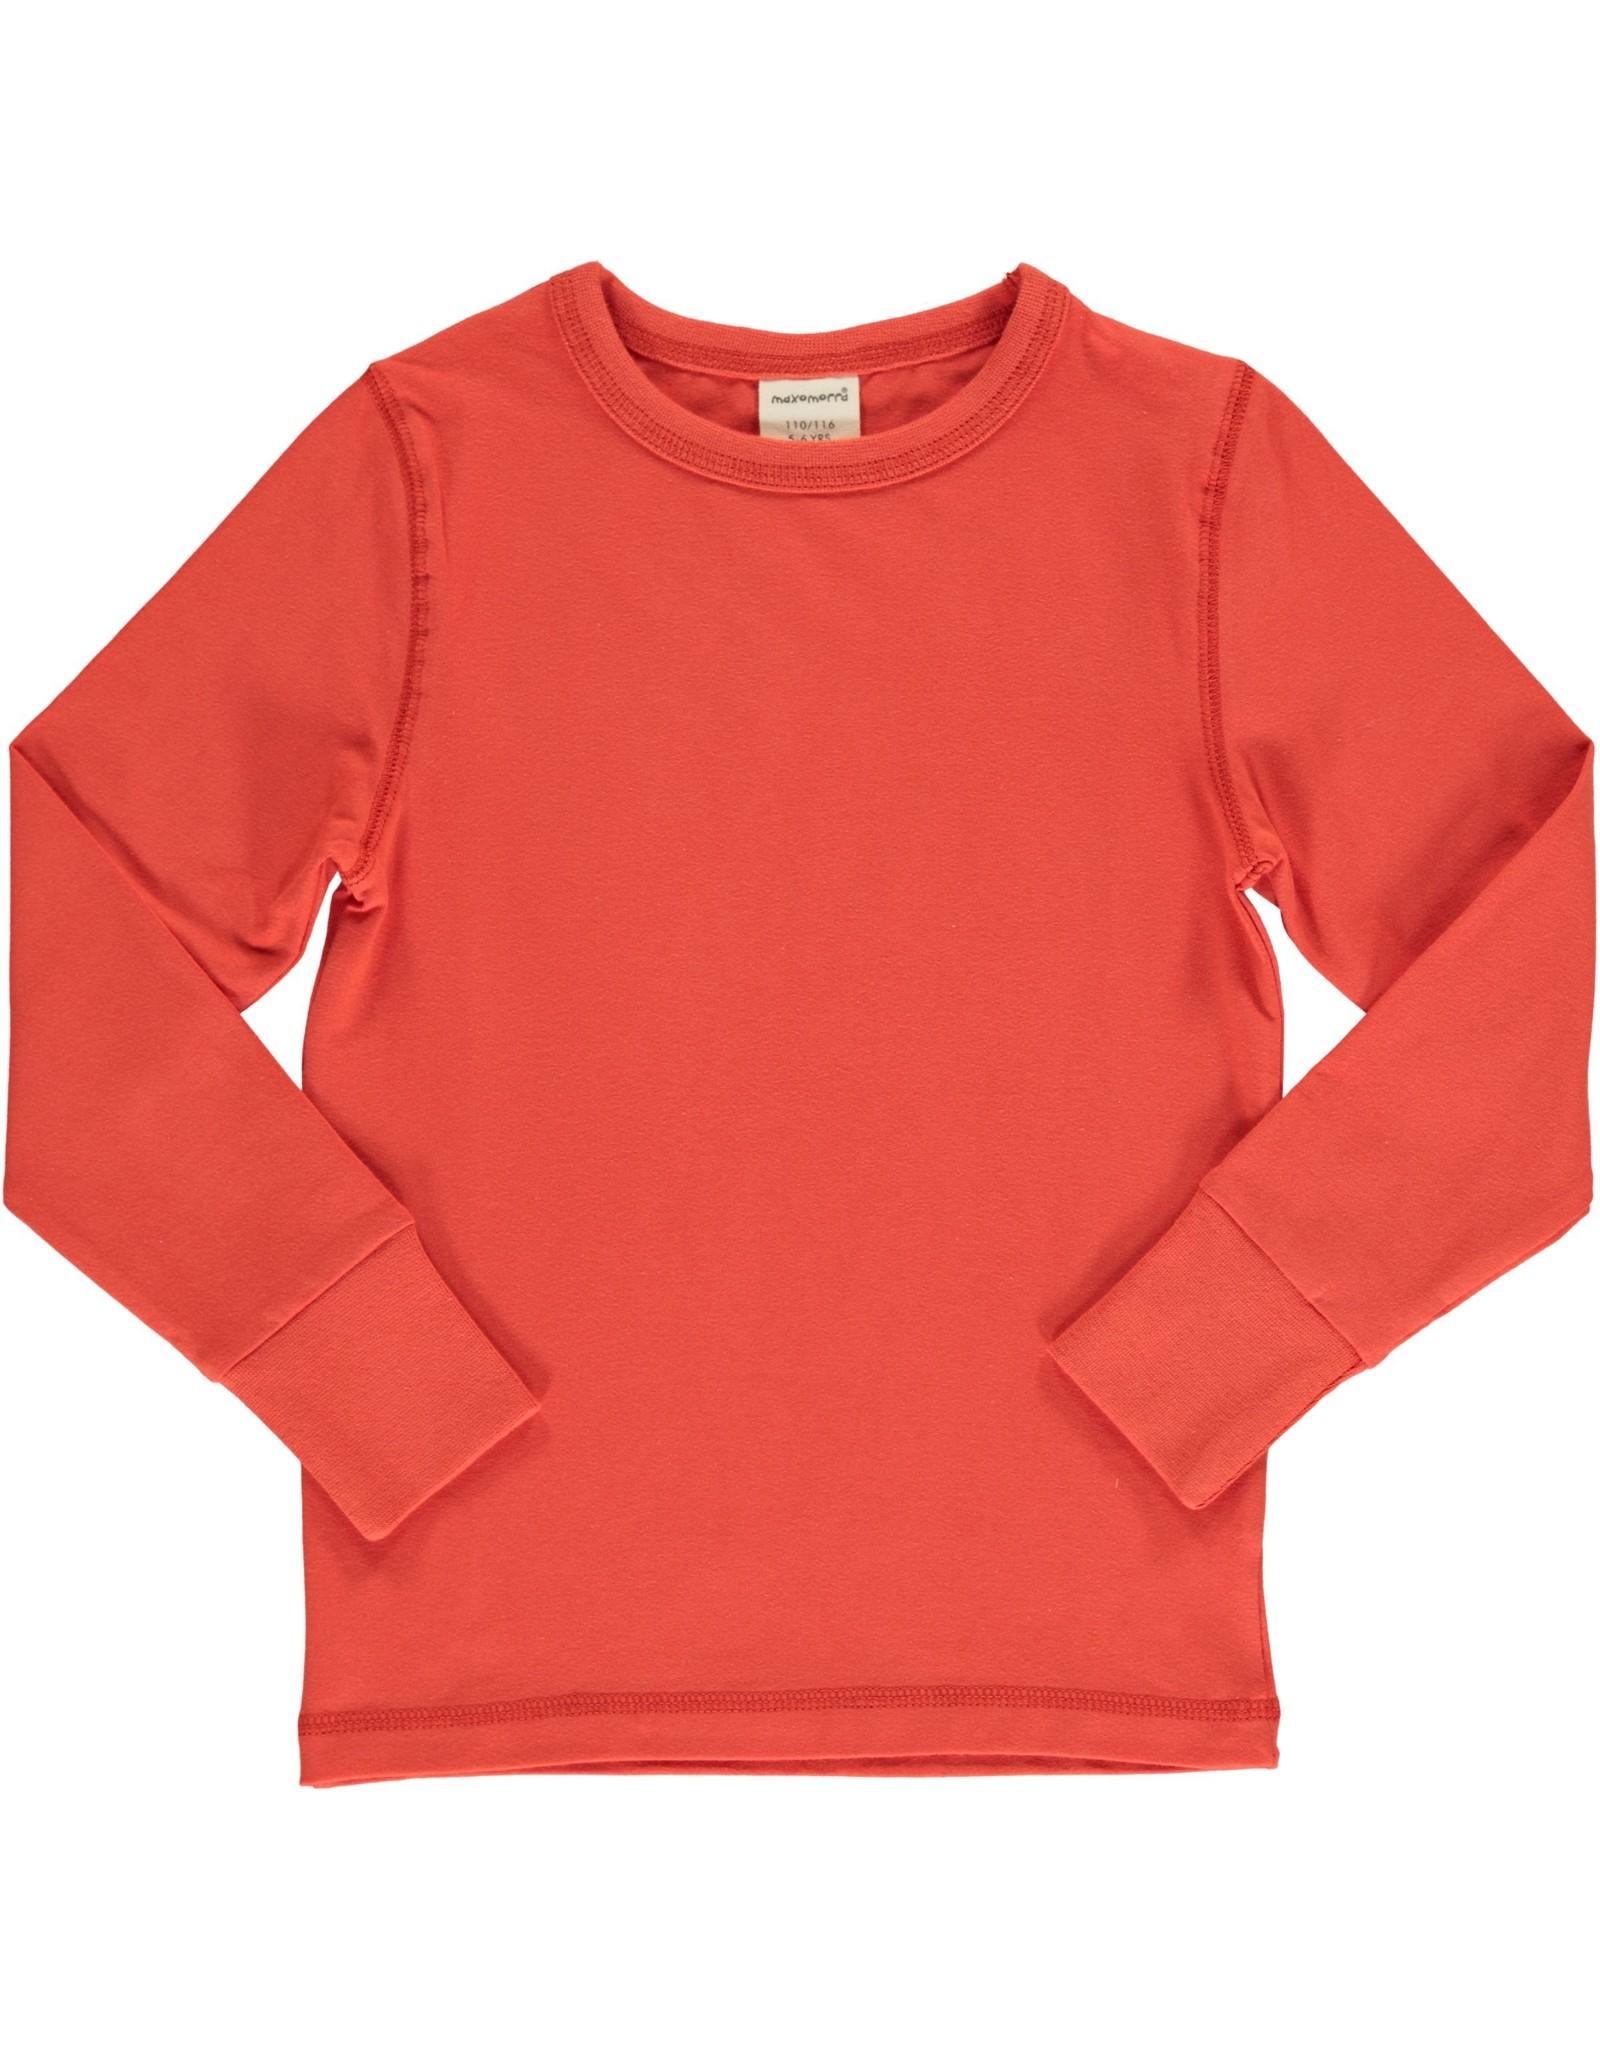 Maxomorra ROWAN effen gekleurde t-shirt - LAATSTE MAAT 122/128